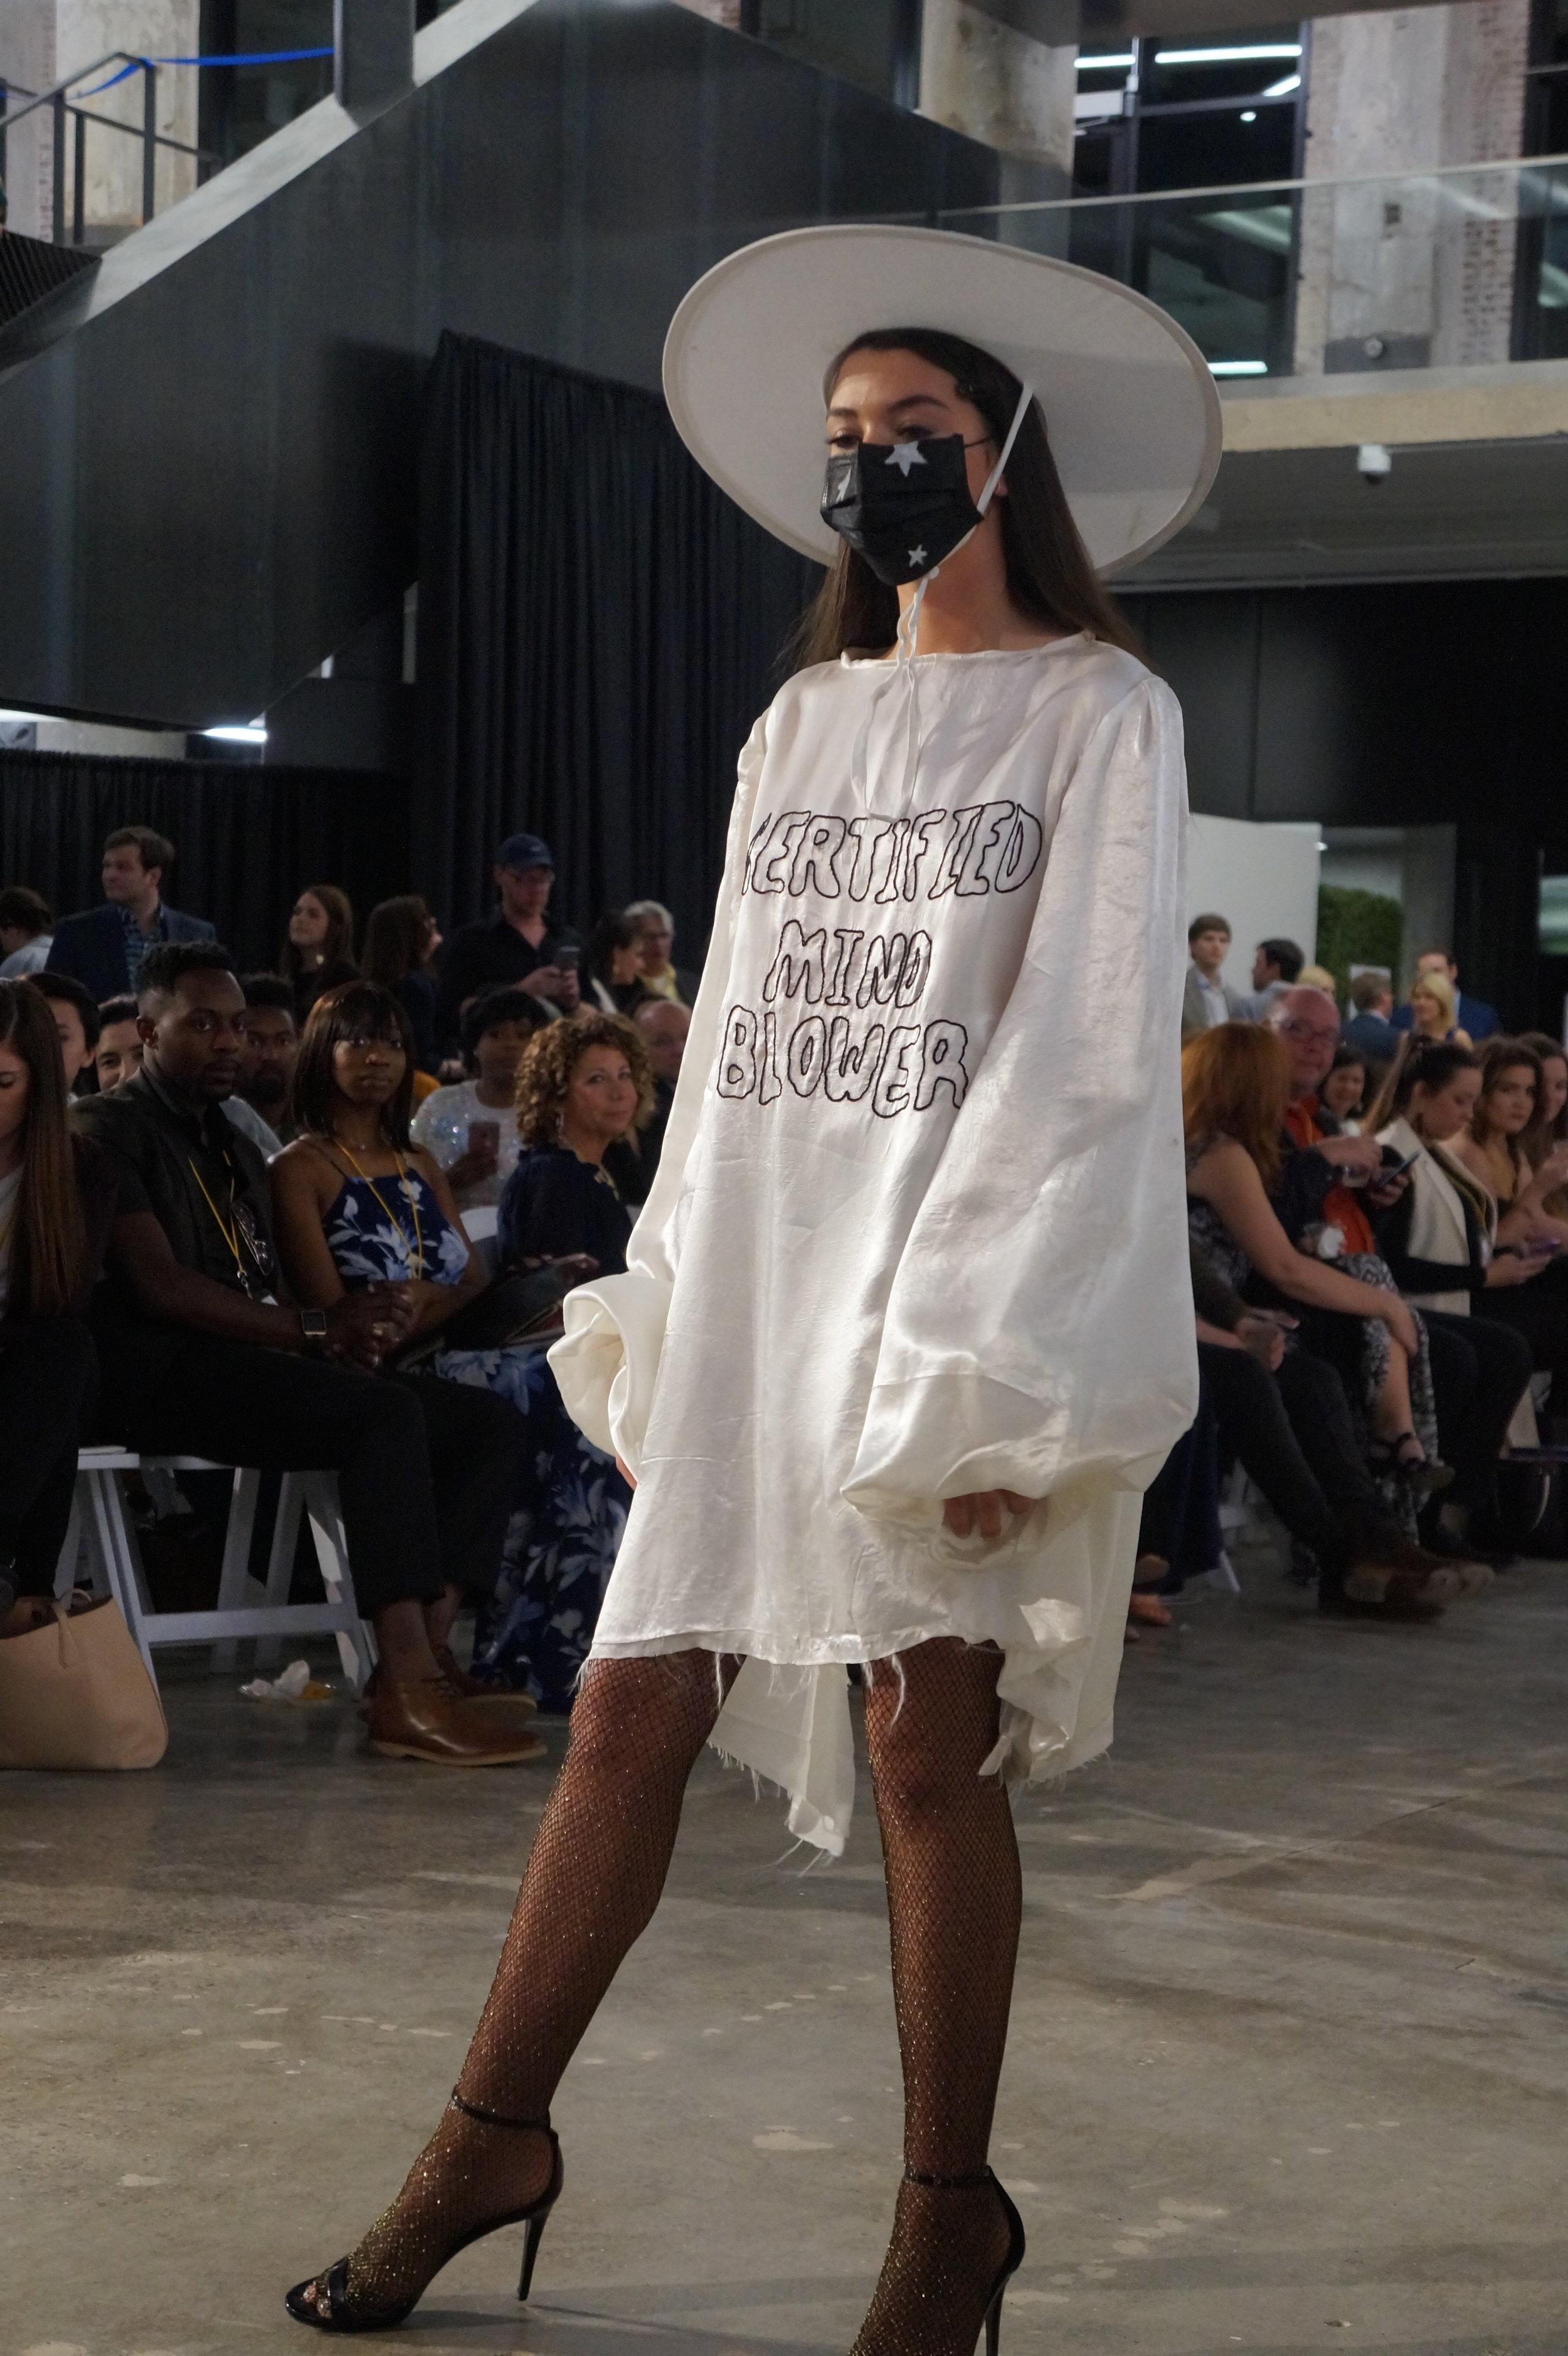 Andrea Fenise Memphis Fashion Blogger shares #memphisfashionweek's featured designer's show